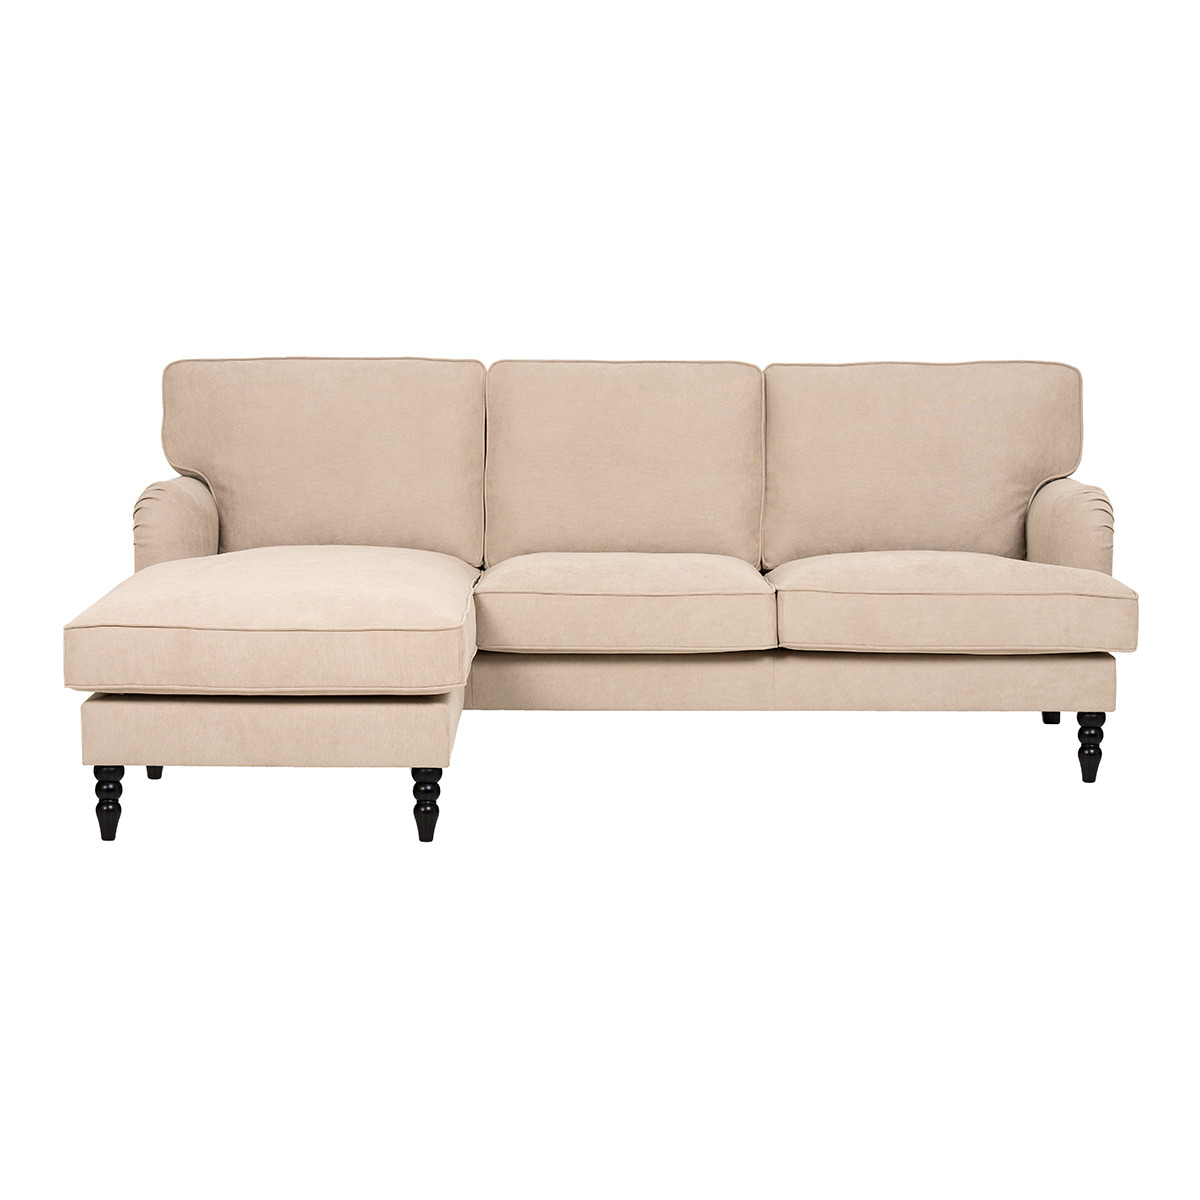 sofa en ingles blue leather ikea sofás